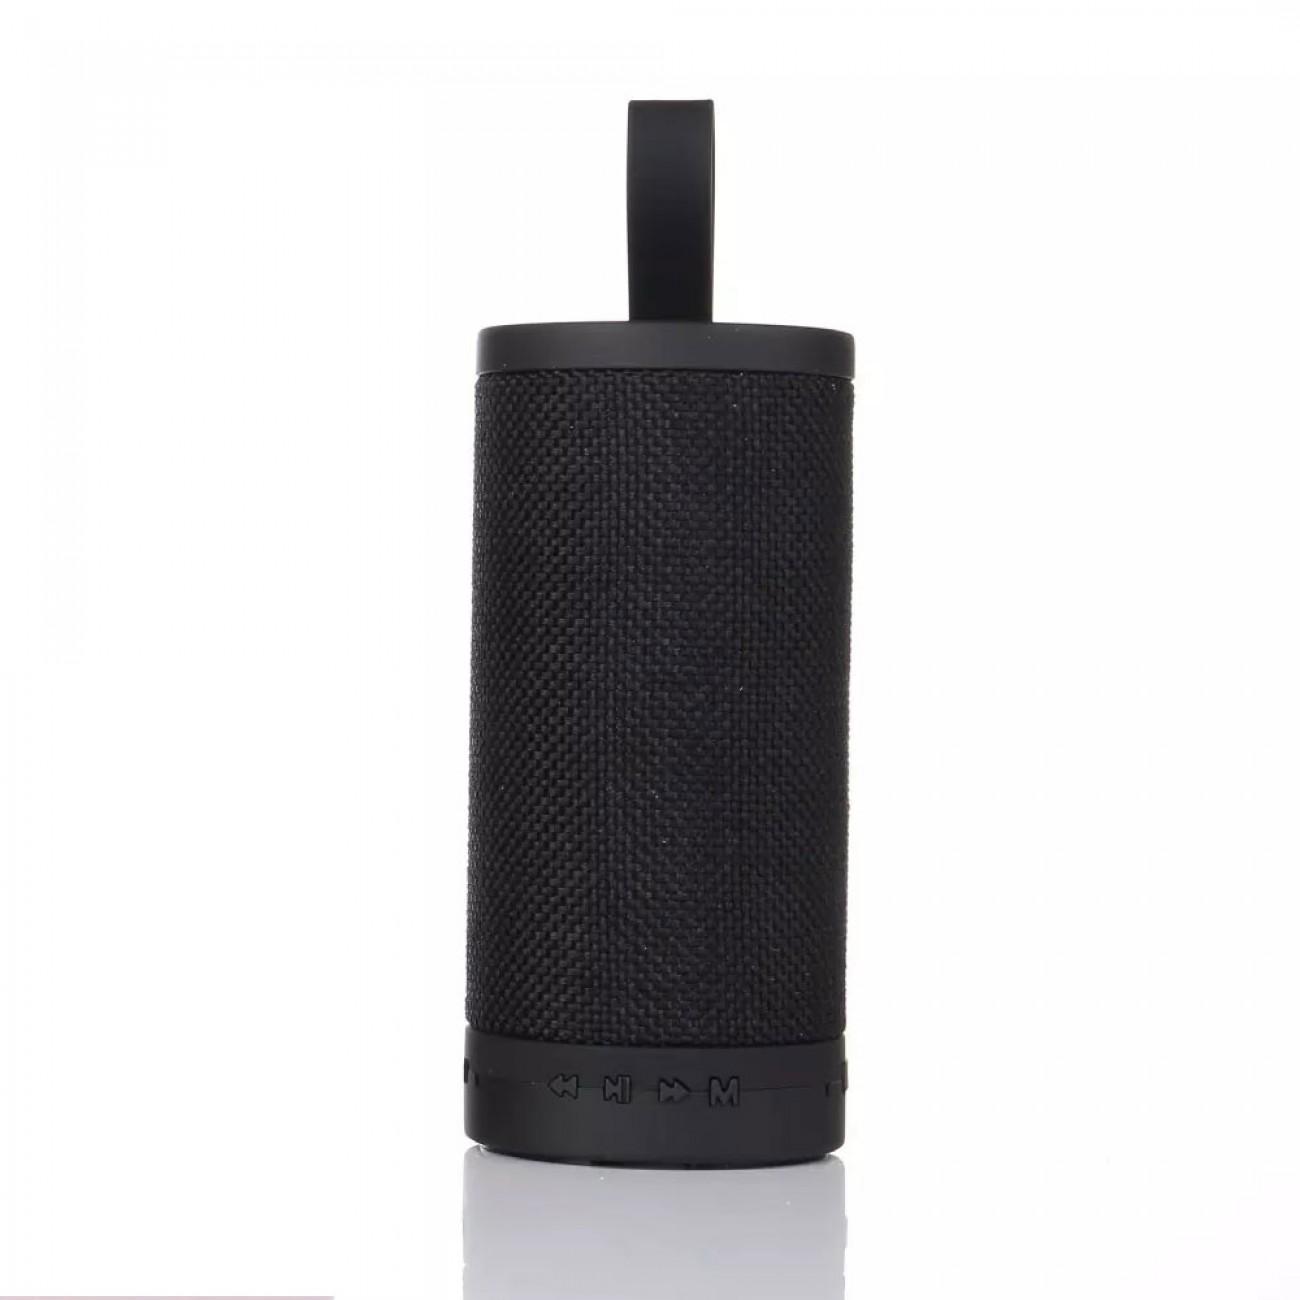 Преносима блутут колонка BLSP22, 3W, Bluetooth, Handsfree, USB, FM радио, Черен в Преносими тонколони - BLSP | Alleop